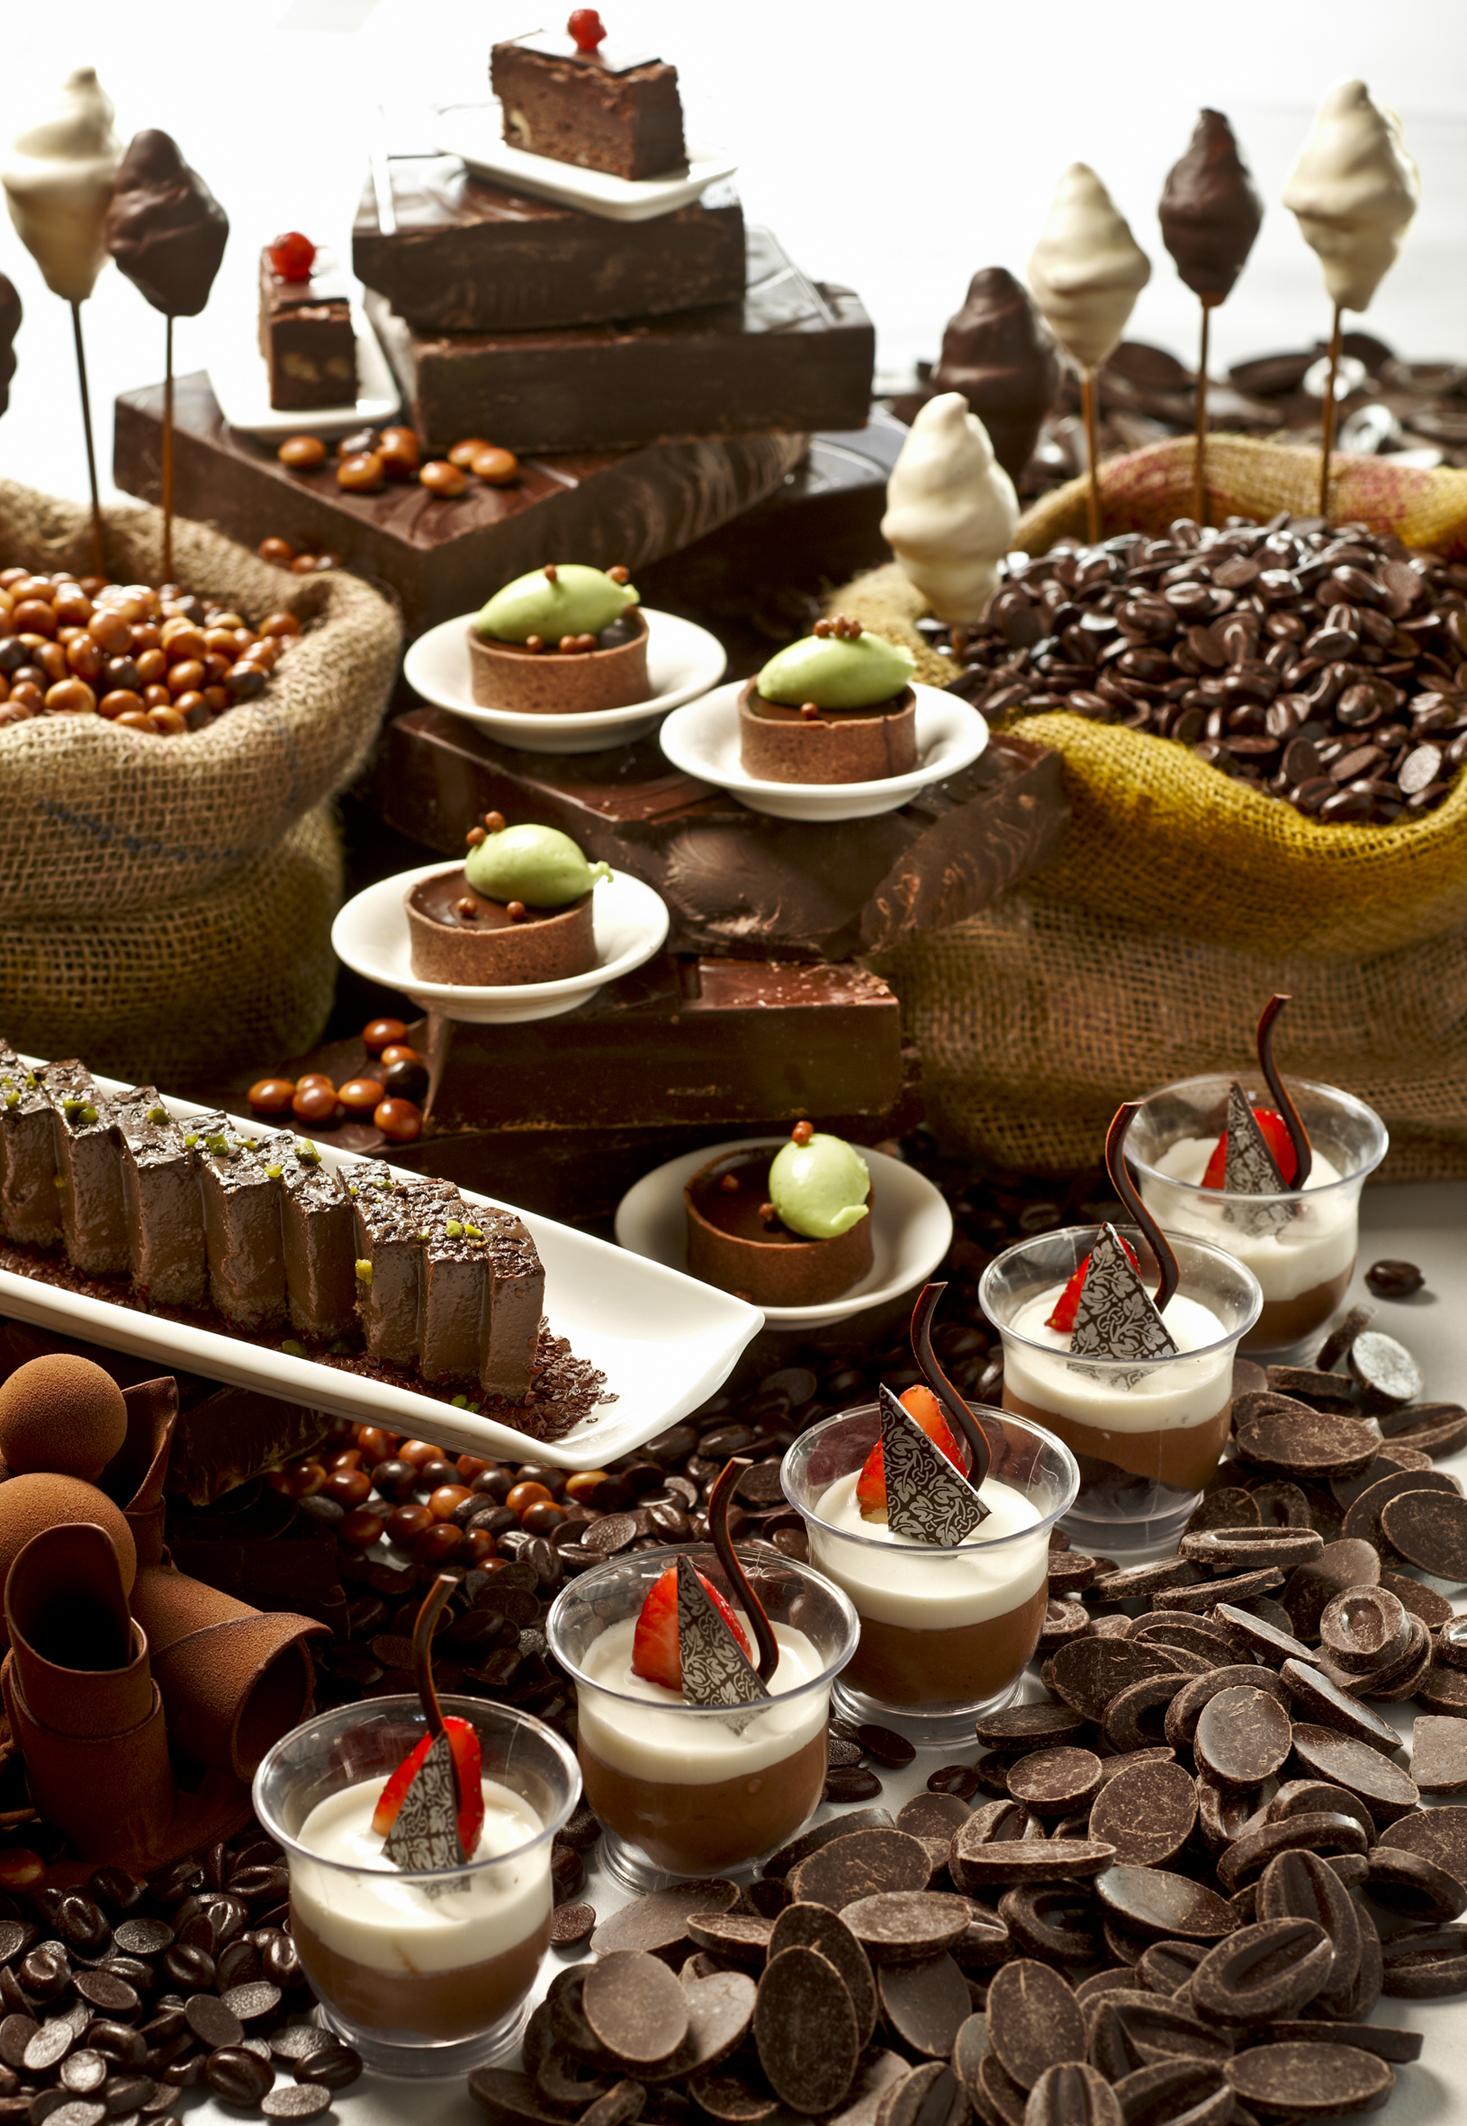 Sweet Yummy Chocolate - Chocolate Photo (34691337) - Fanpop